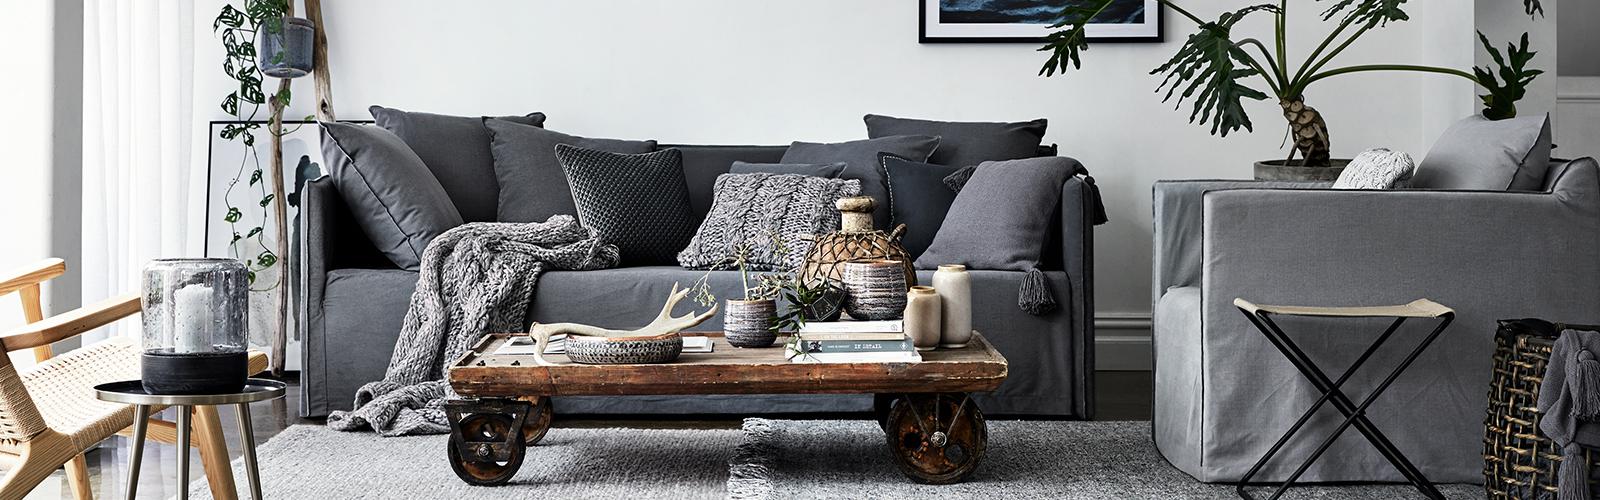 interior design assistant jobs australia south africa